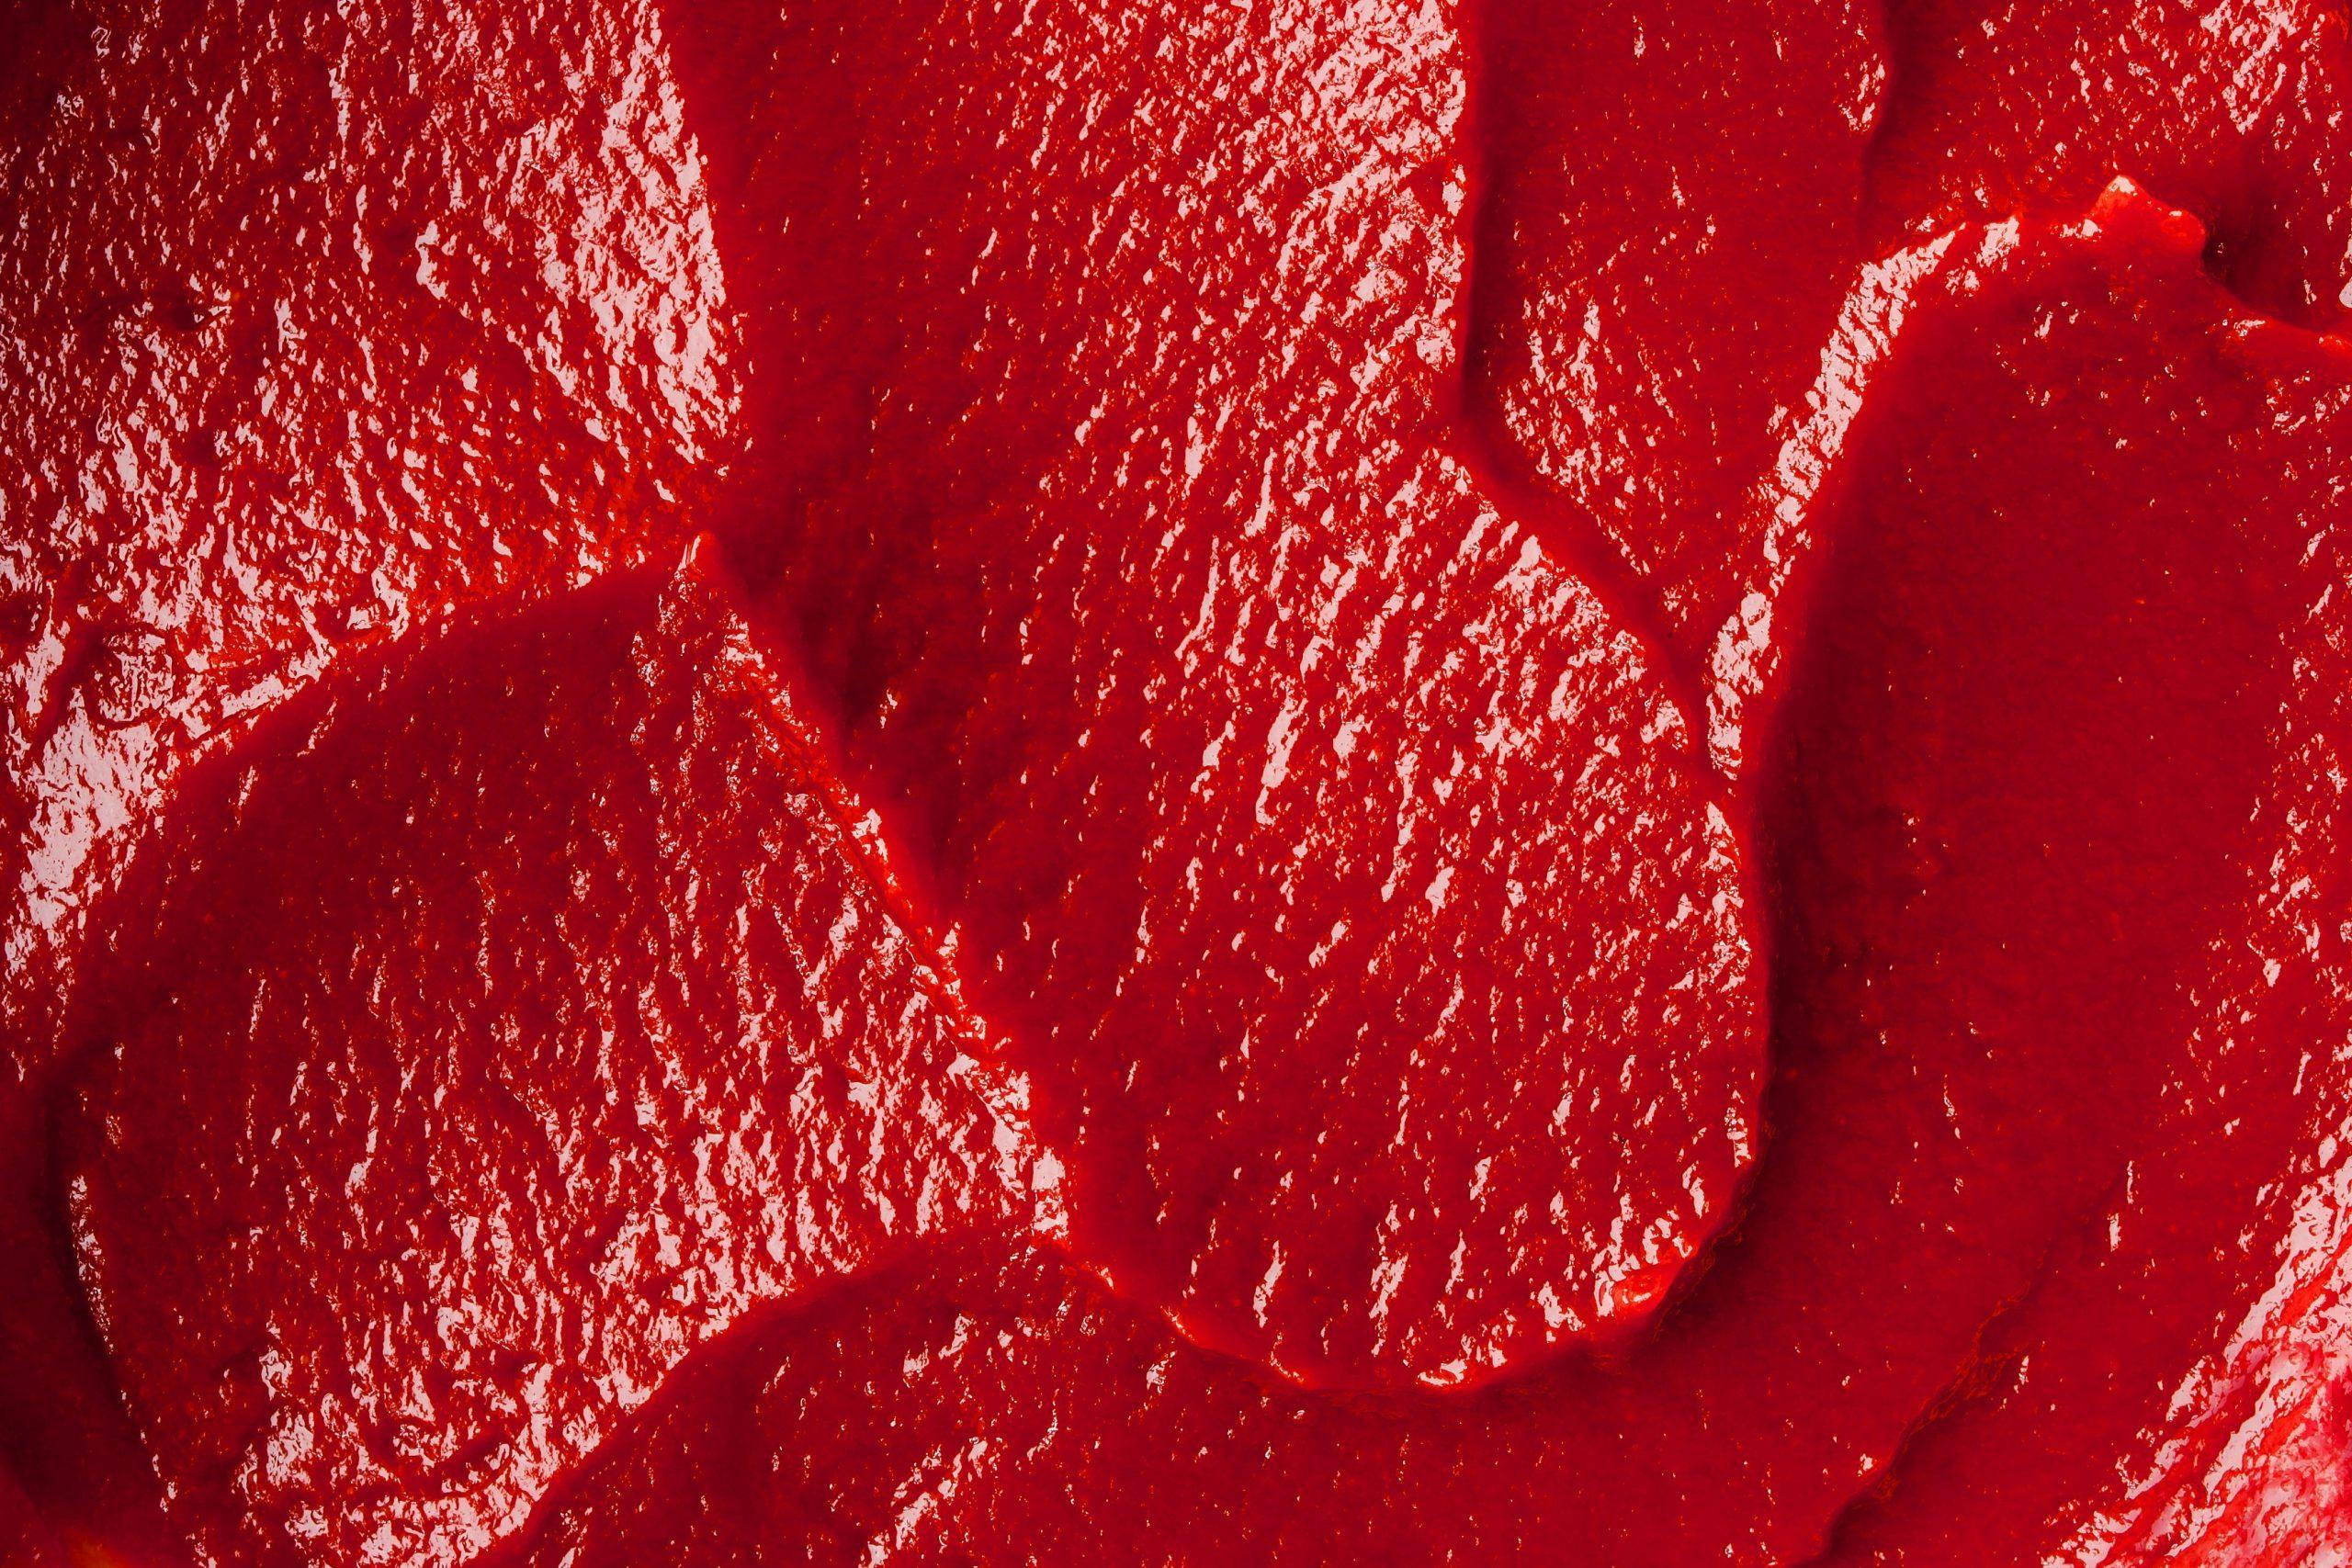 Tomato paste texture close-up horizontal